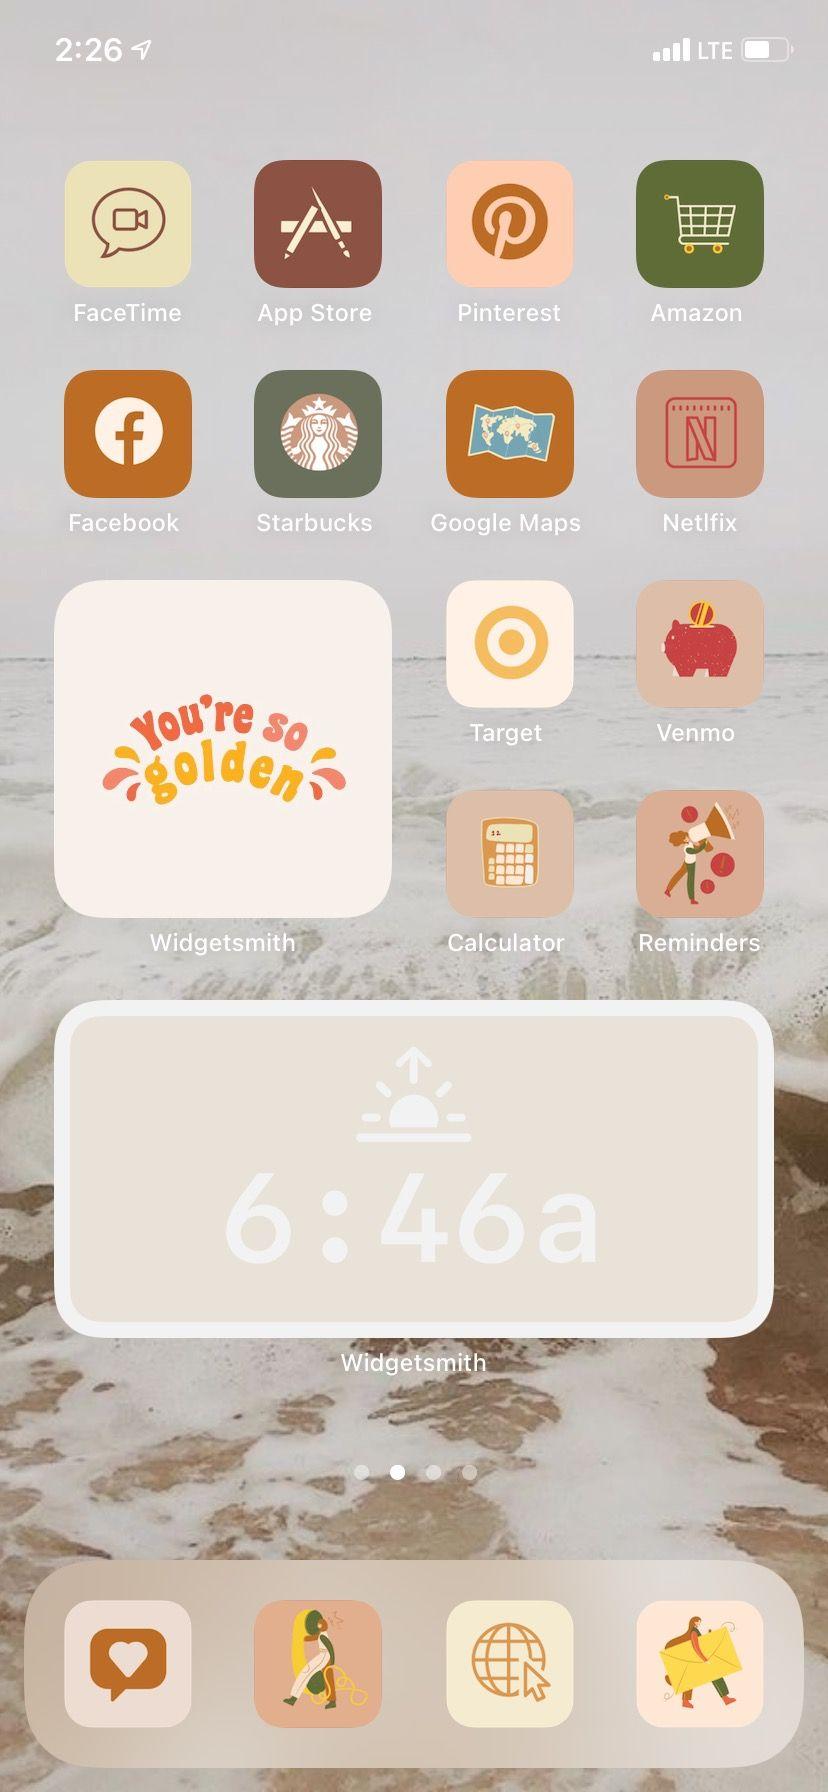 Boho Aesthetic Iphone App Icons Boho Ios 14 App Icon Pack Etsy In 2021 Iphone Wallpaper App Homescreen Homescreen Iphone